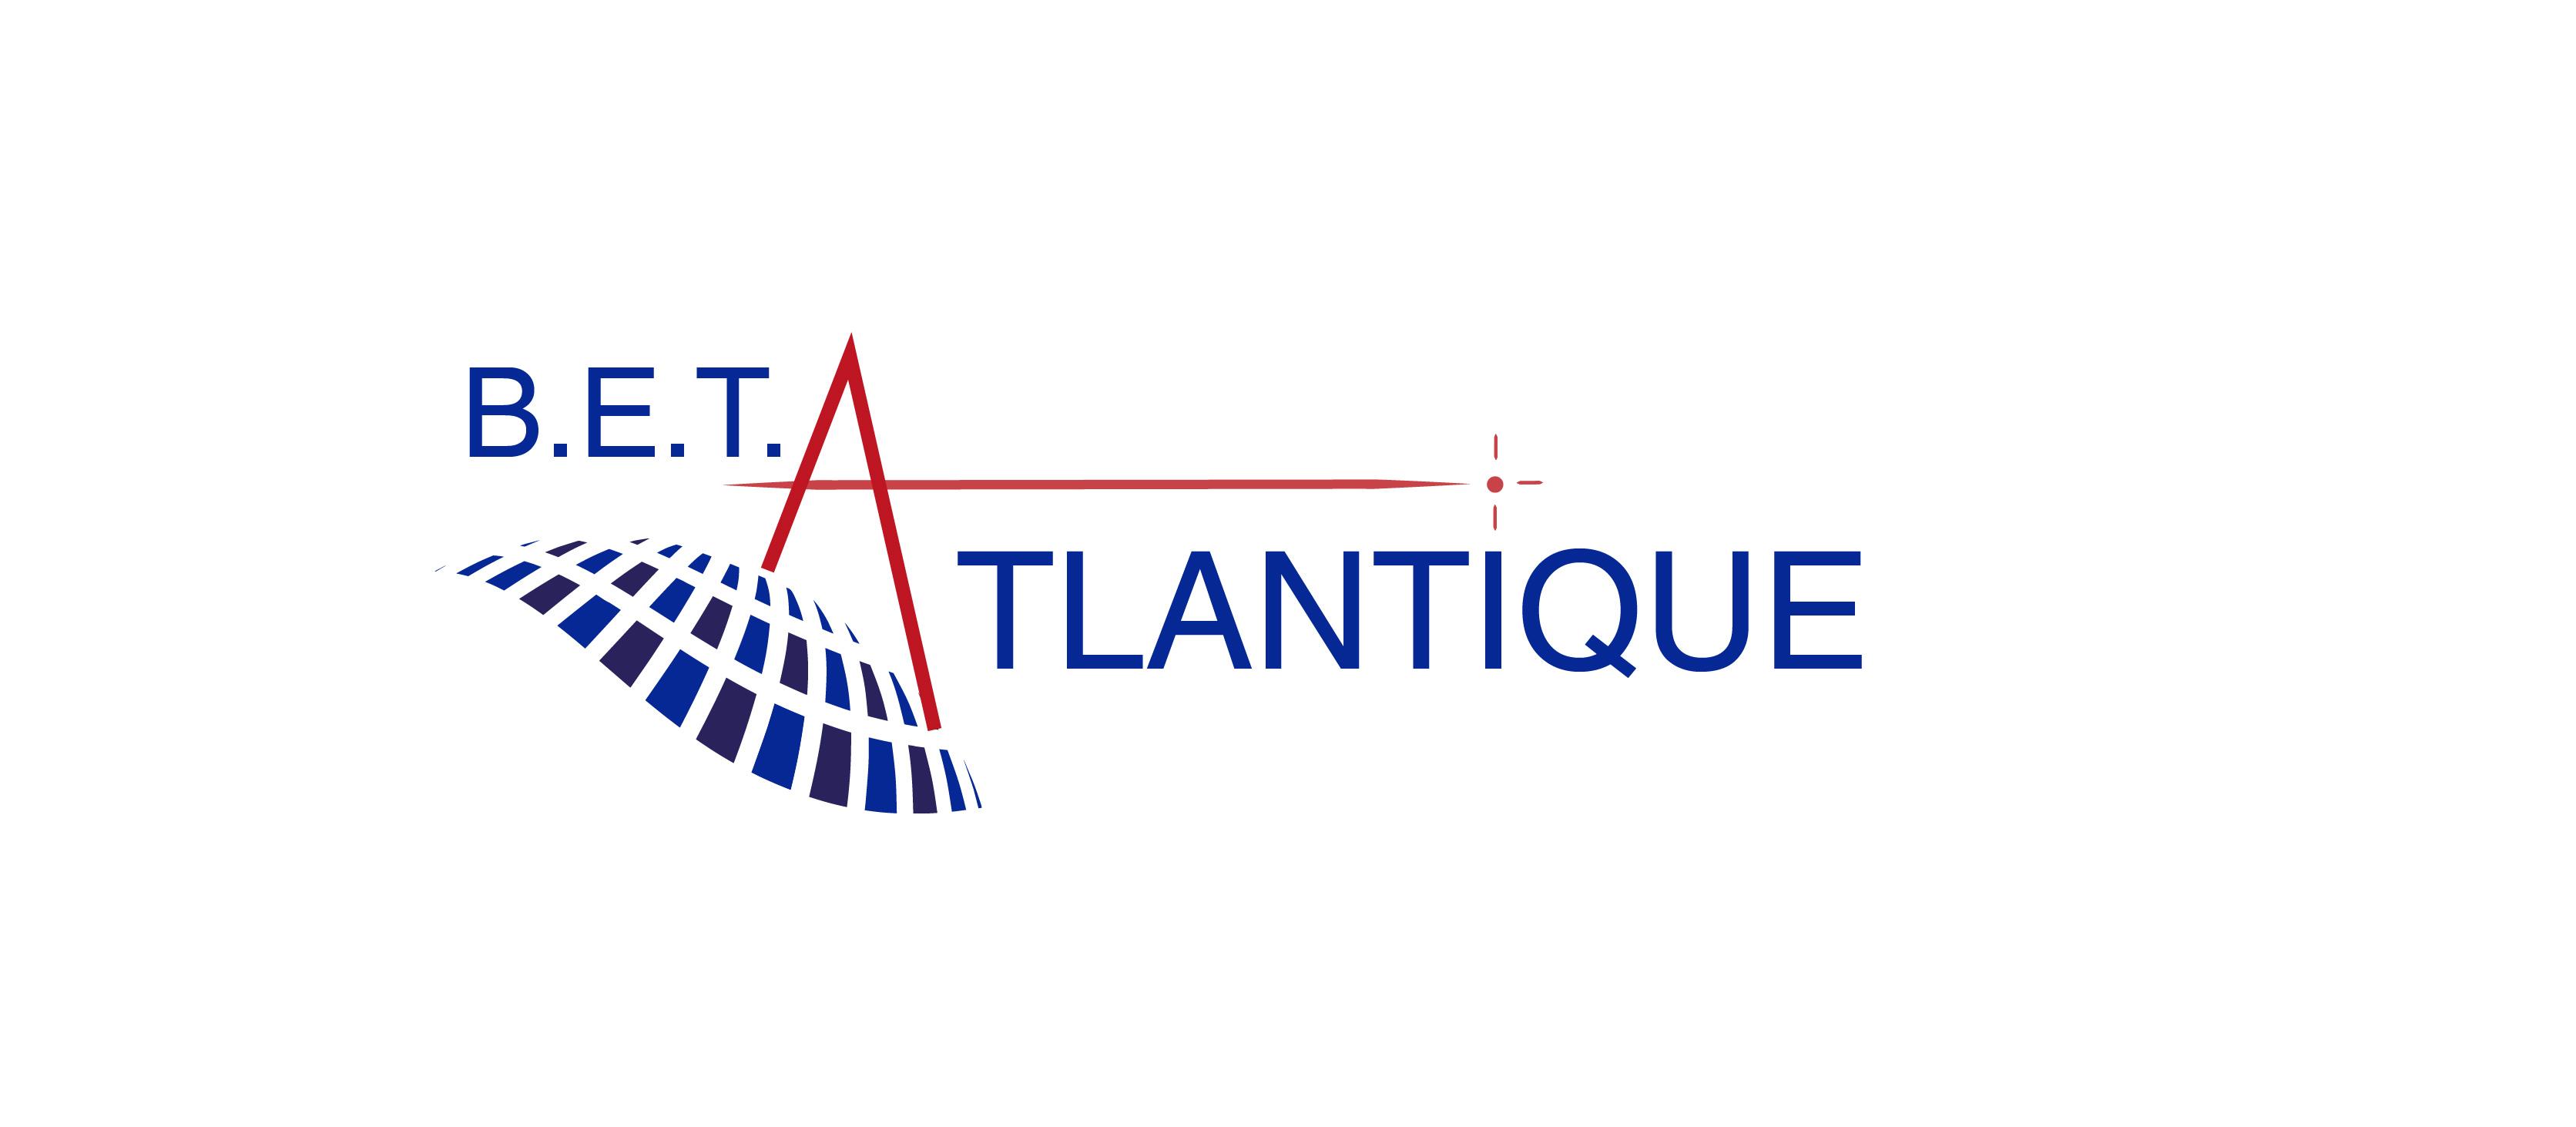 B.E.T.Atlantique